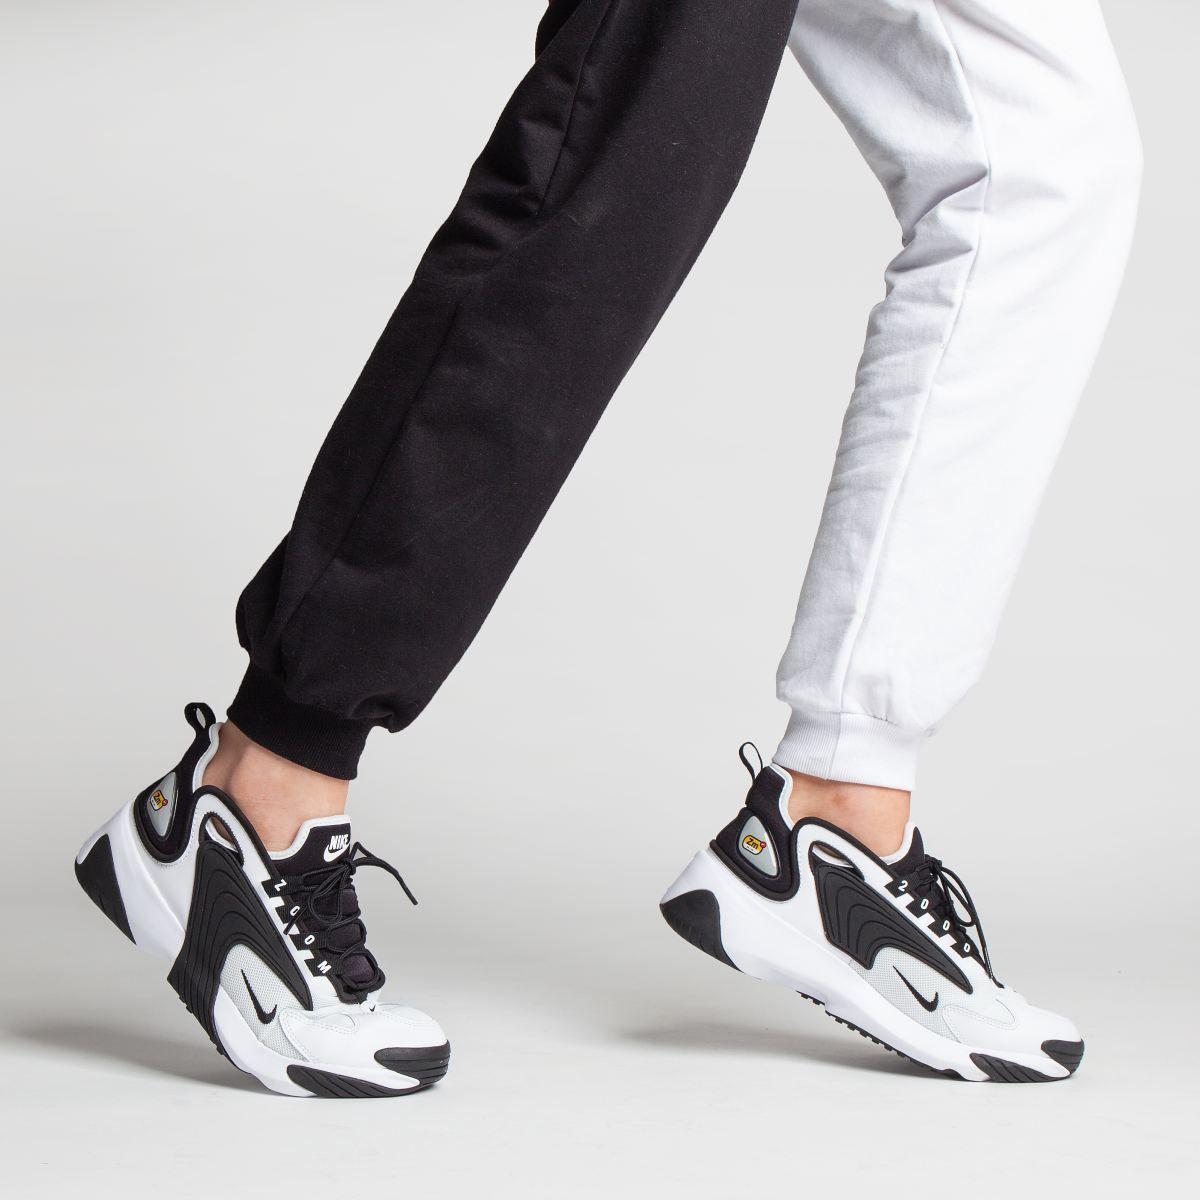 Womens White & Black Nike Zoom 2k Trainers | Black nikes ...